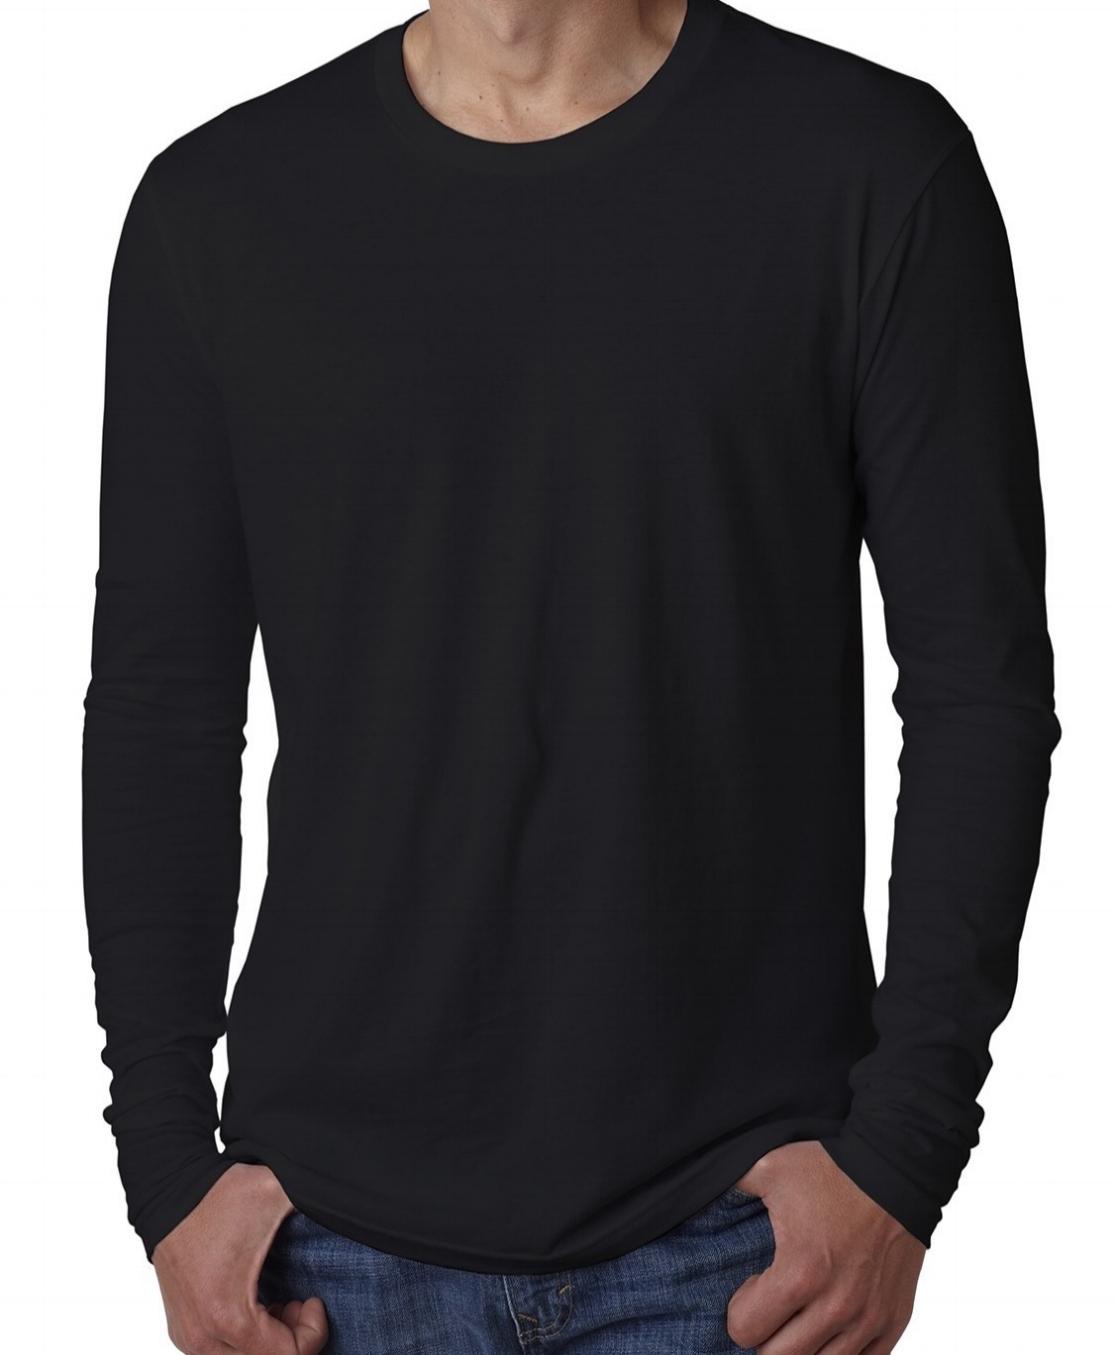 Unisex cotton long-sleeve crew neck (100% cotton, longer length, $$).